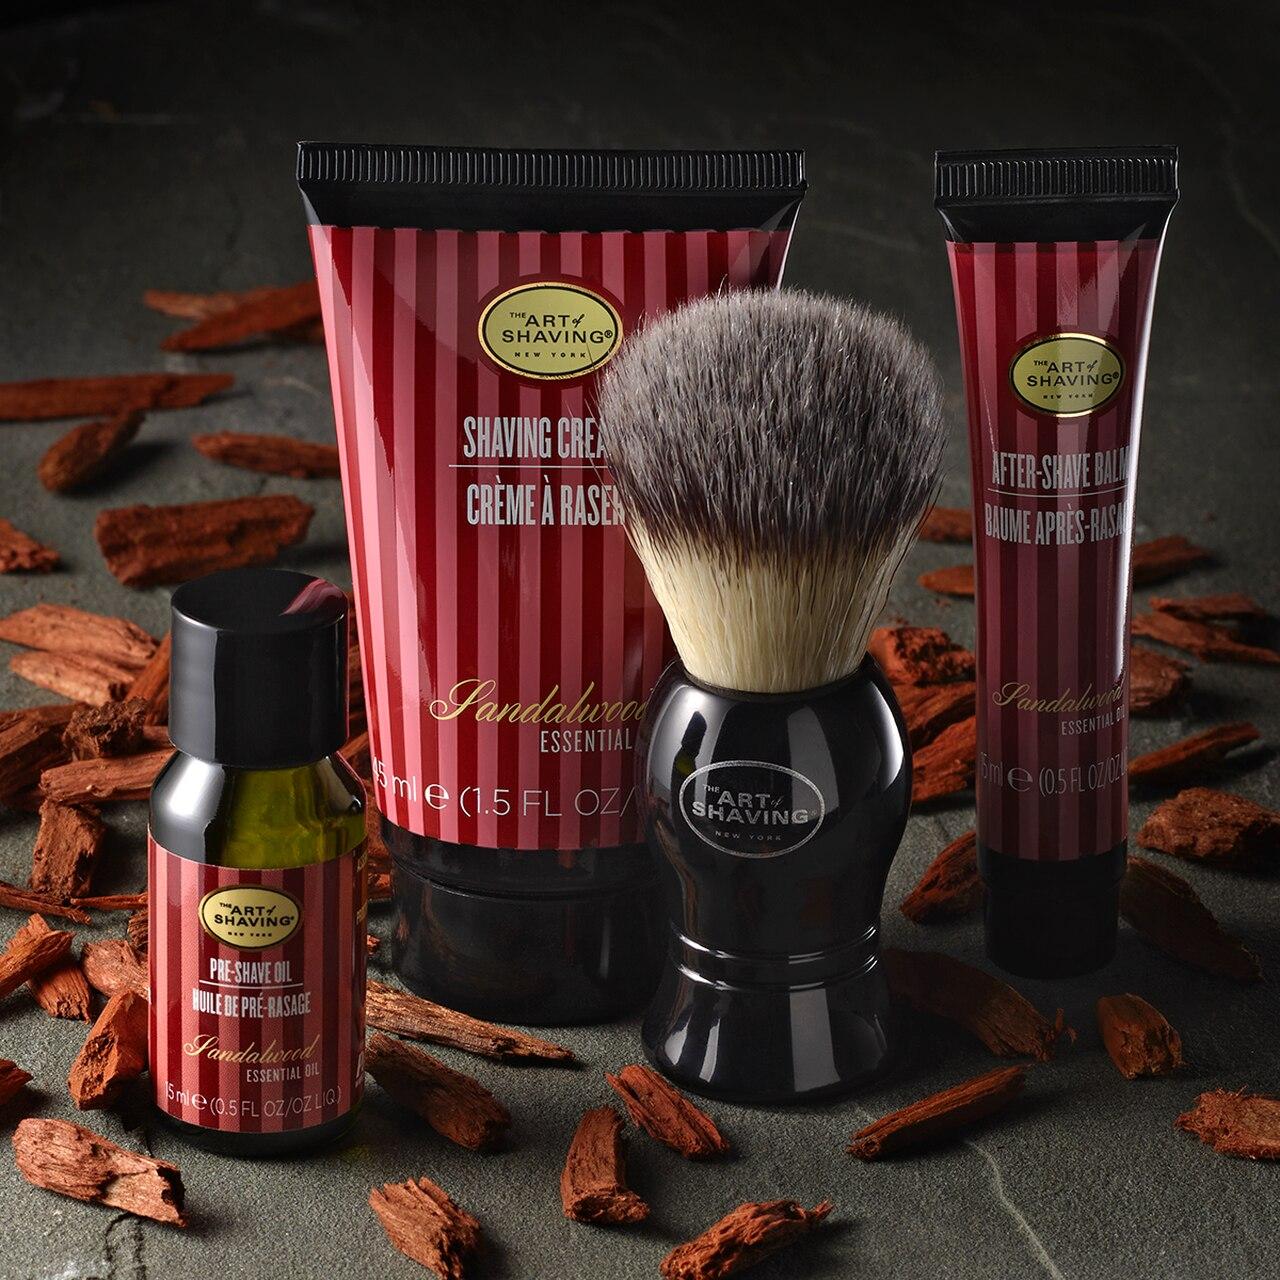 Gifted Groomer Kit